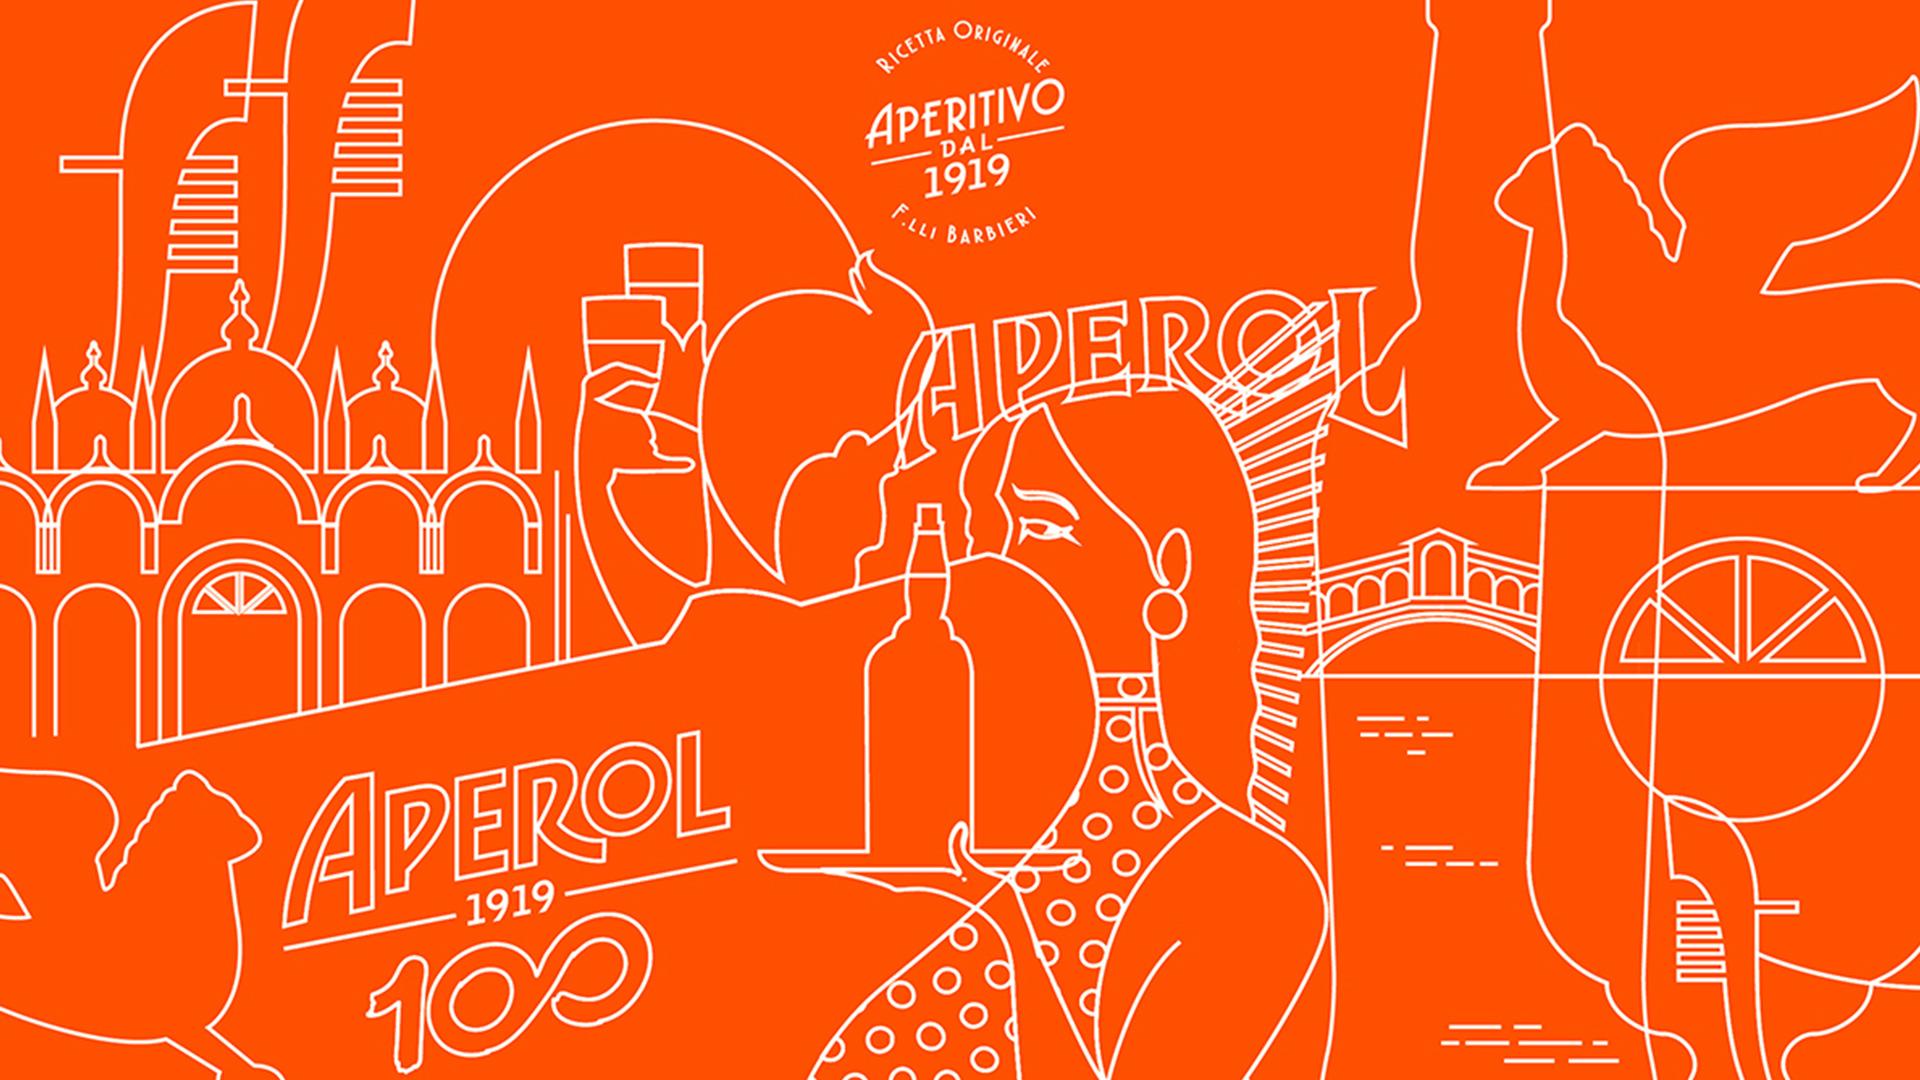 Aperol-Rba-Design-004